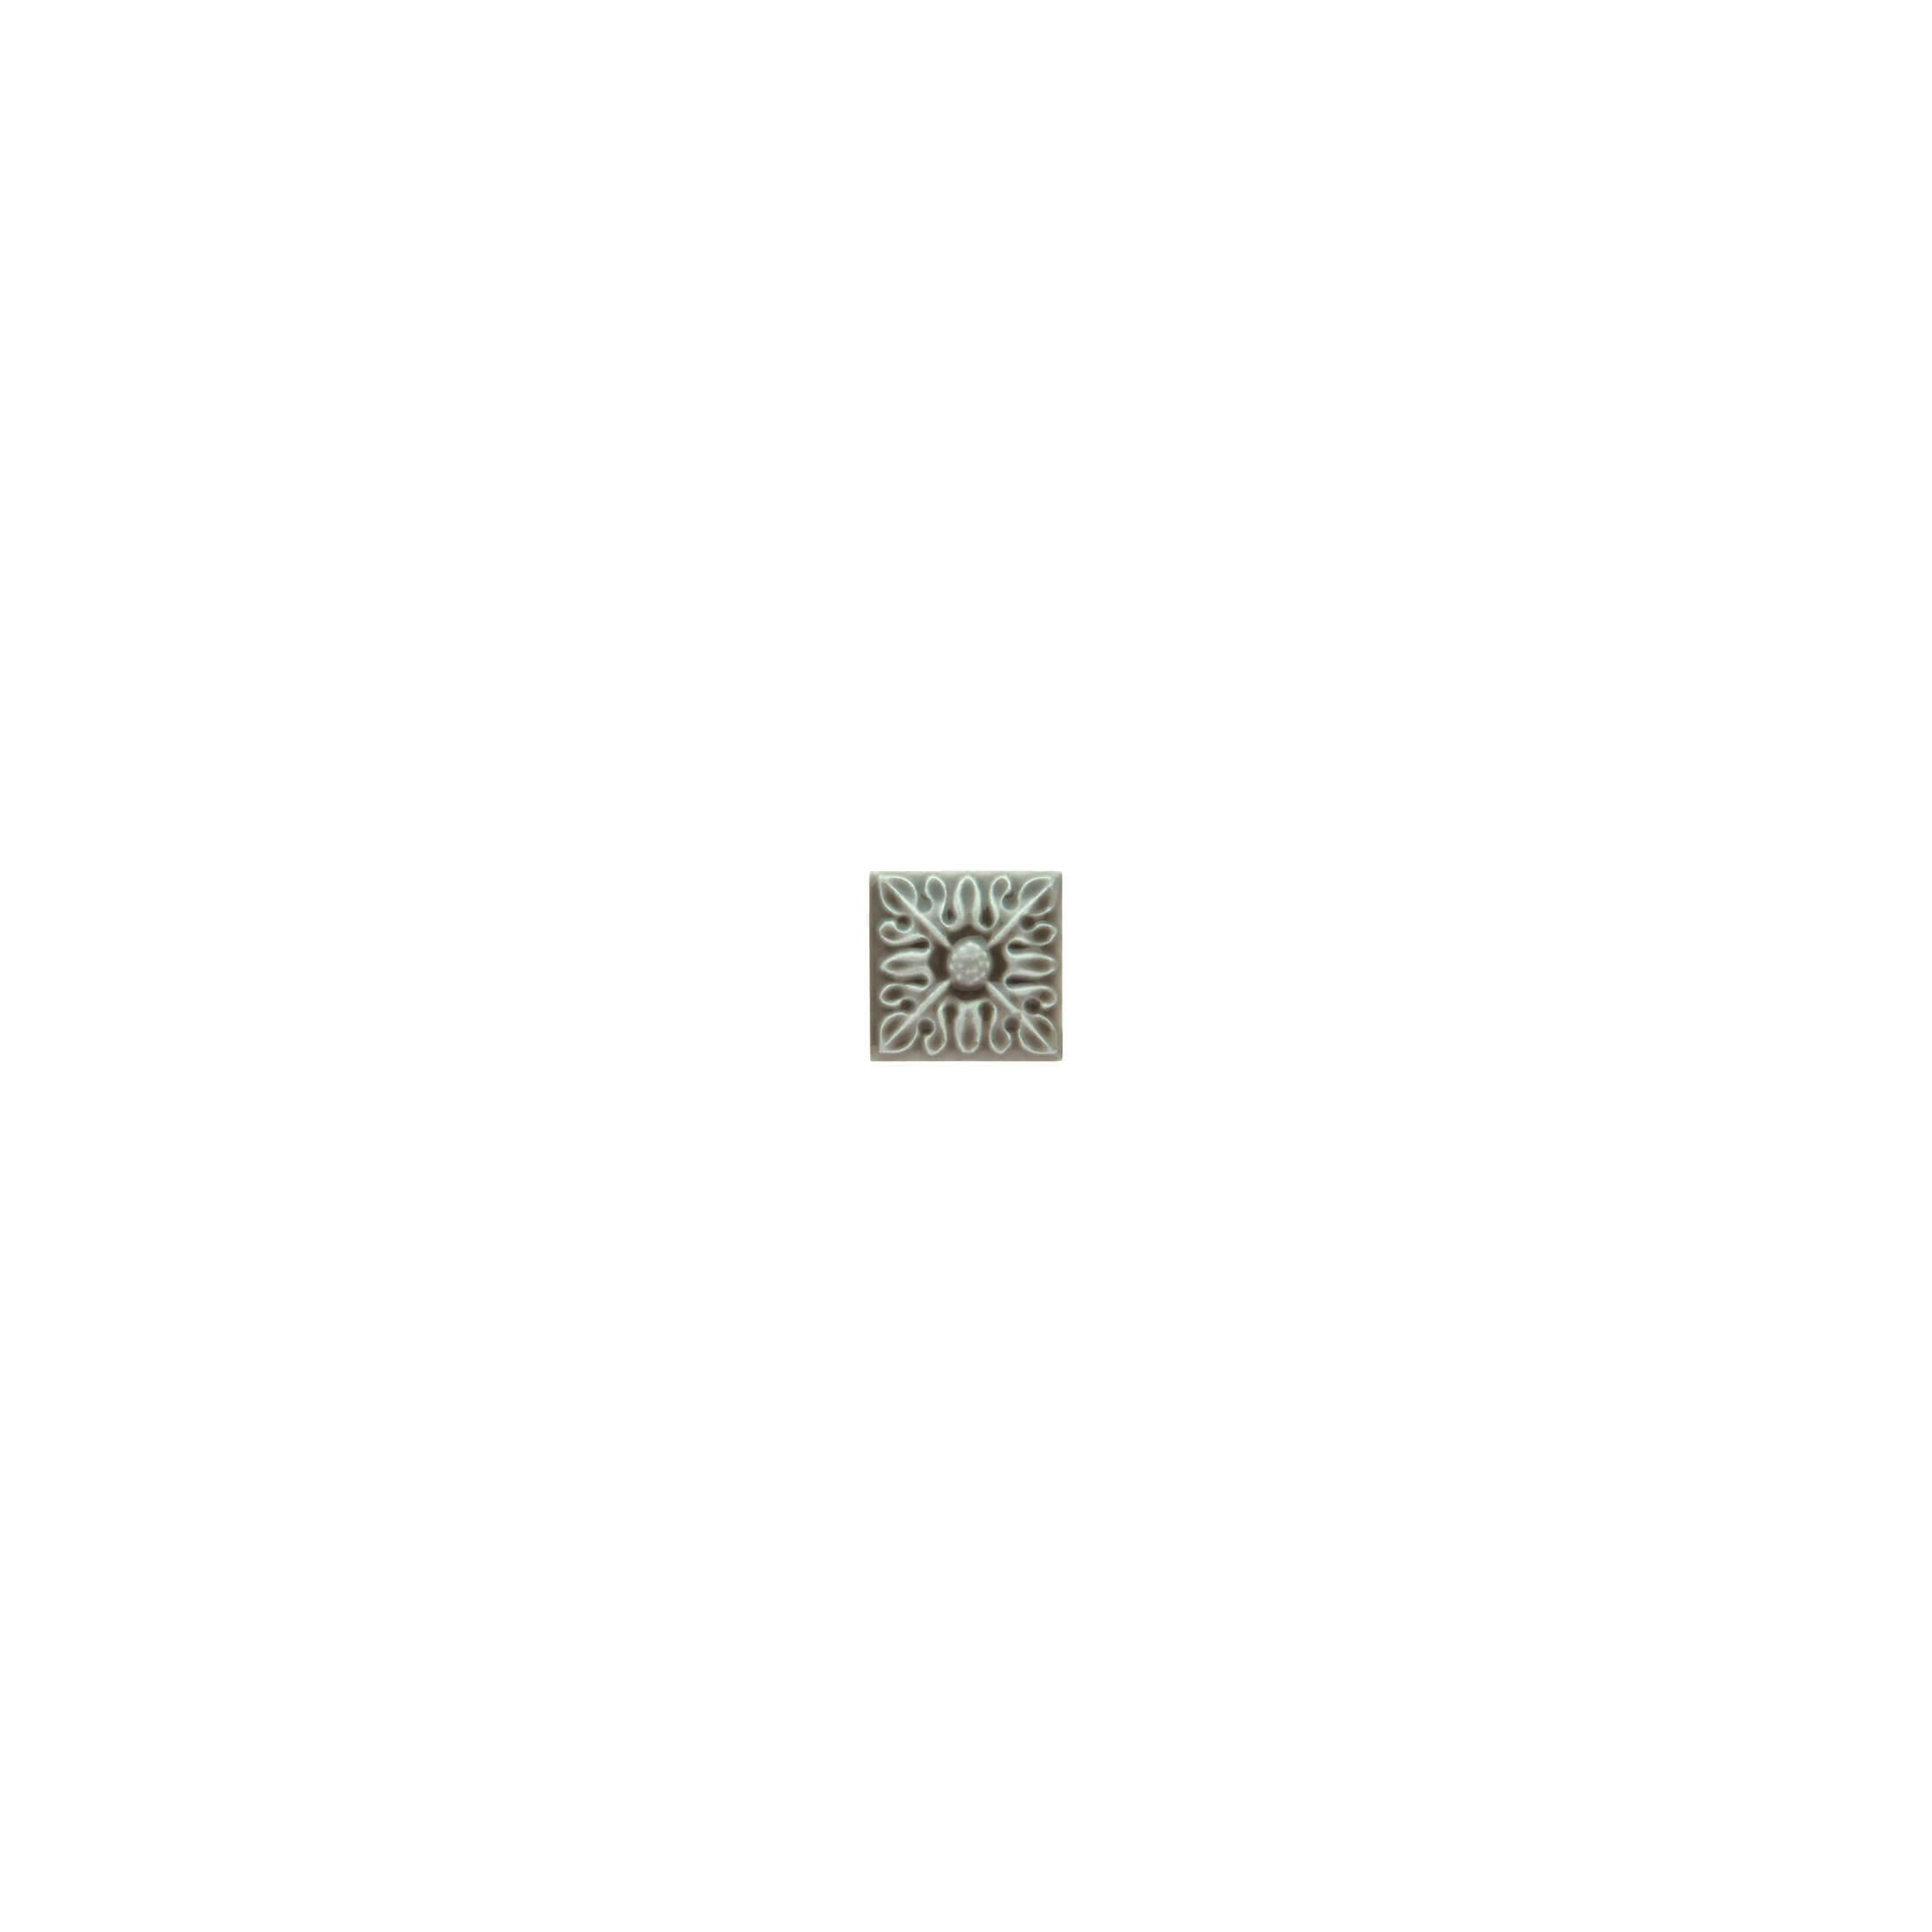 ADEX-ADST4063-TACO-RELIEVE FLOR Nº 2-3 cm-3 cm-STUDIO>EUCALYPTUS